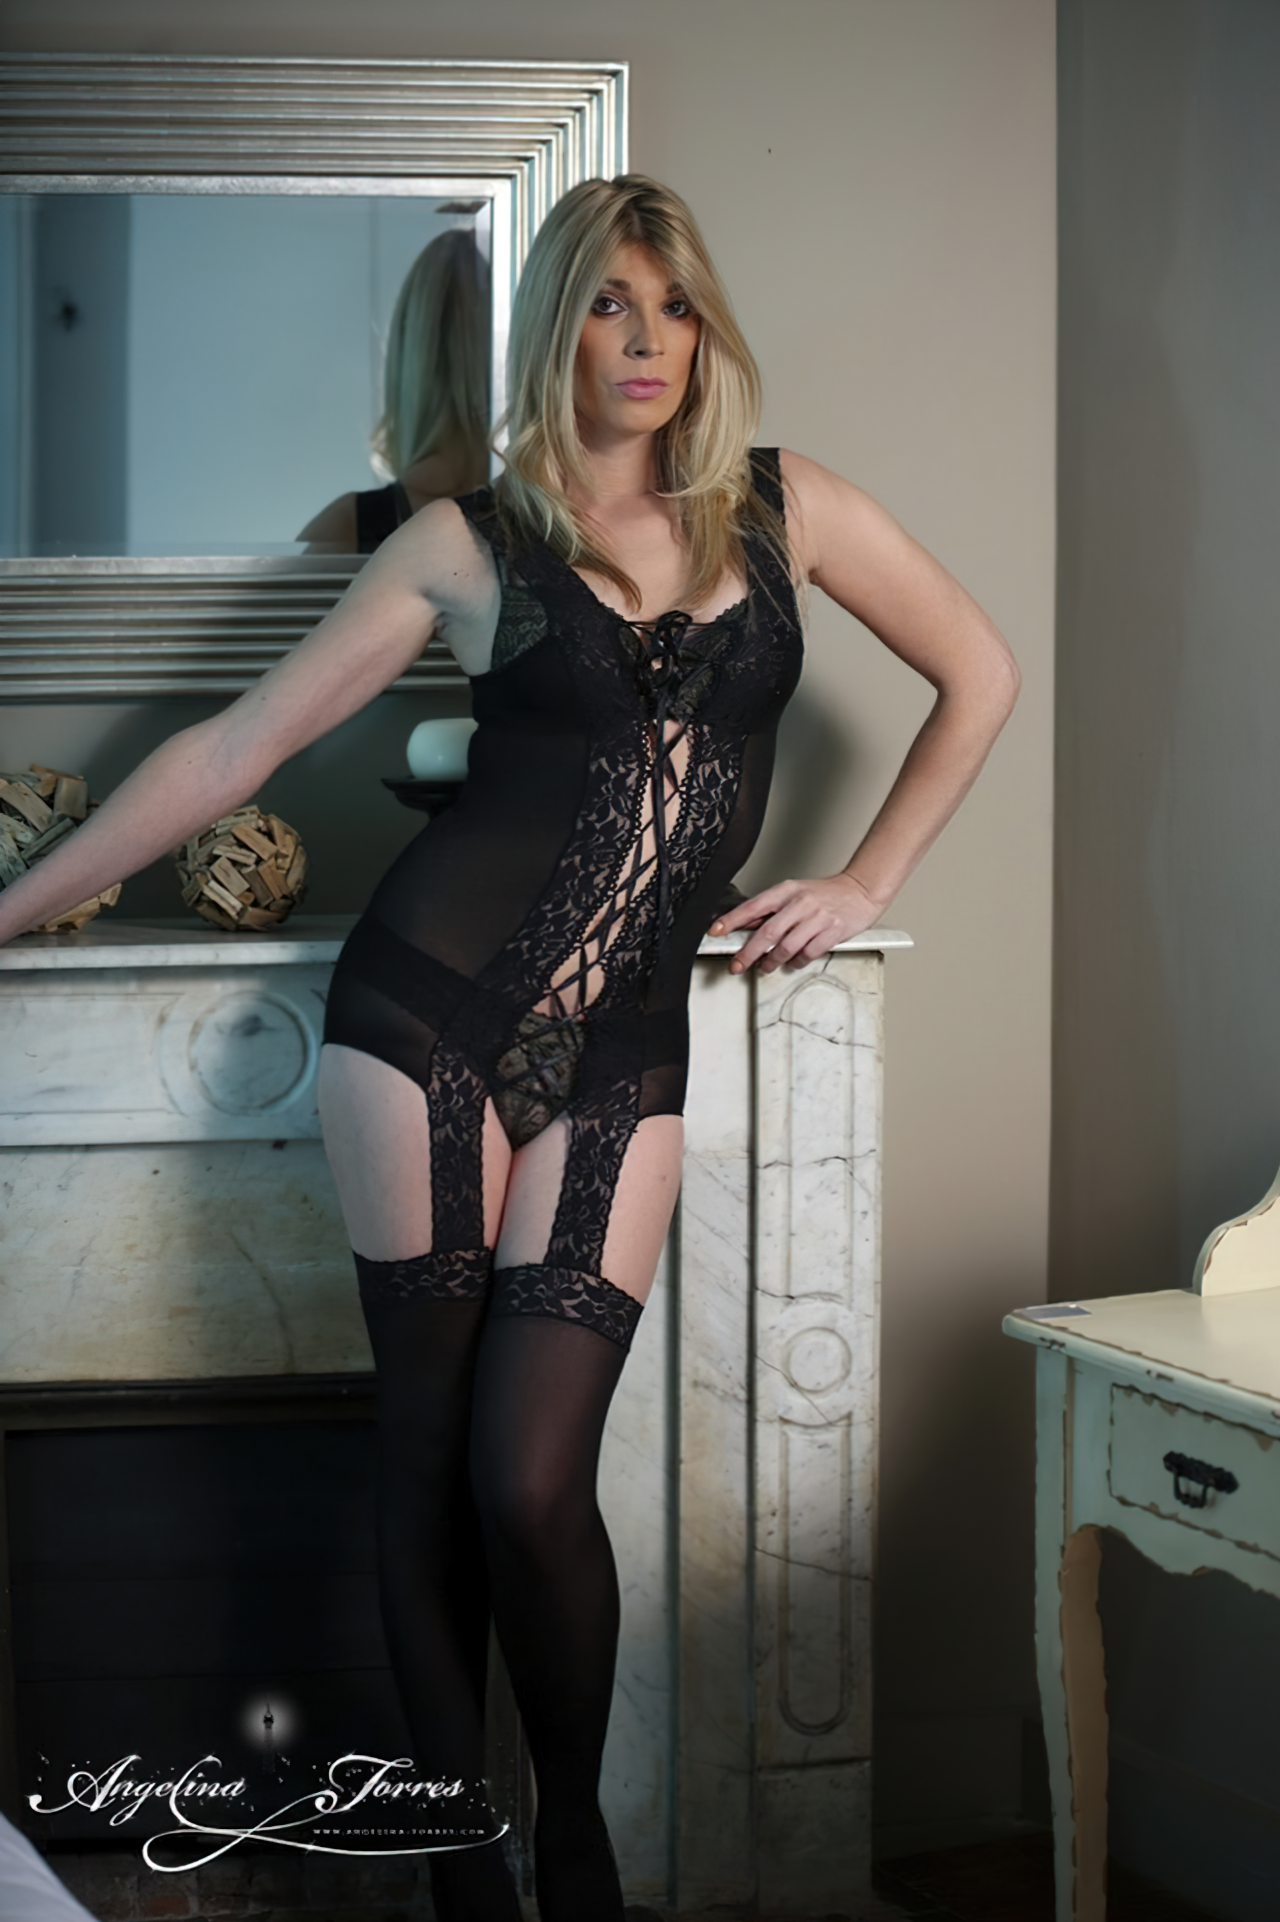 Angelina Torres Travesti (1)